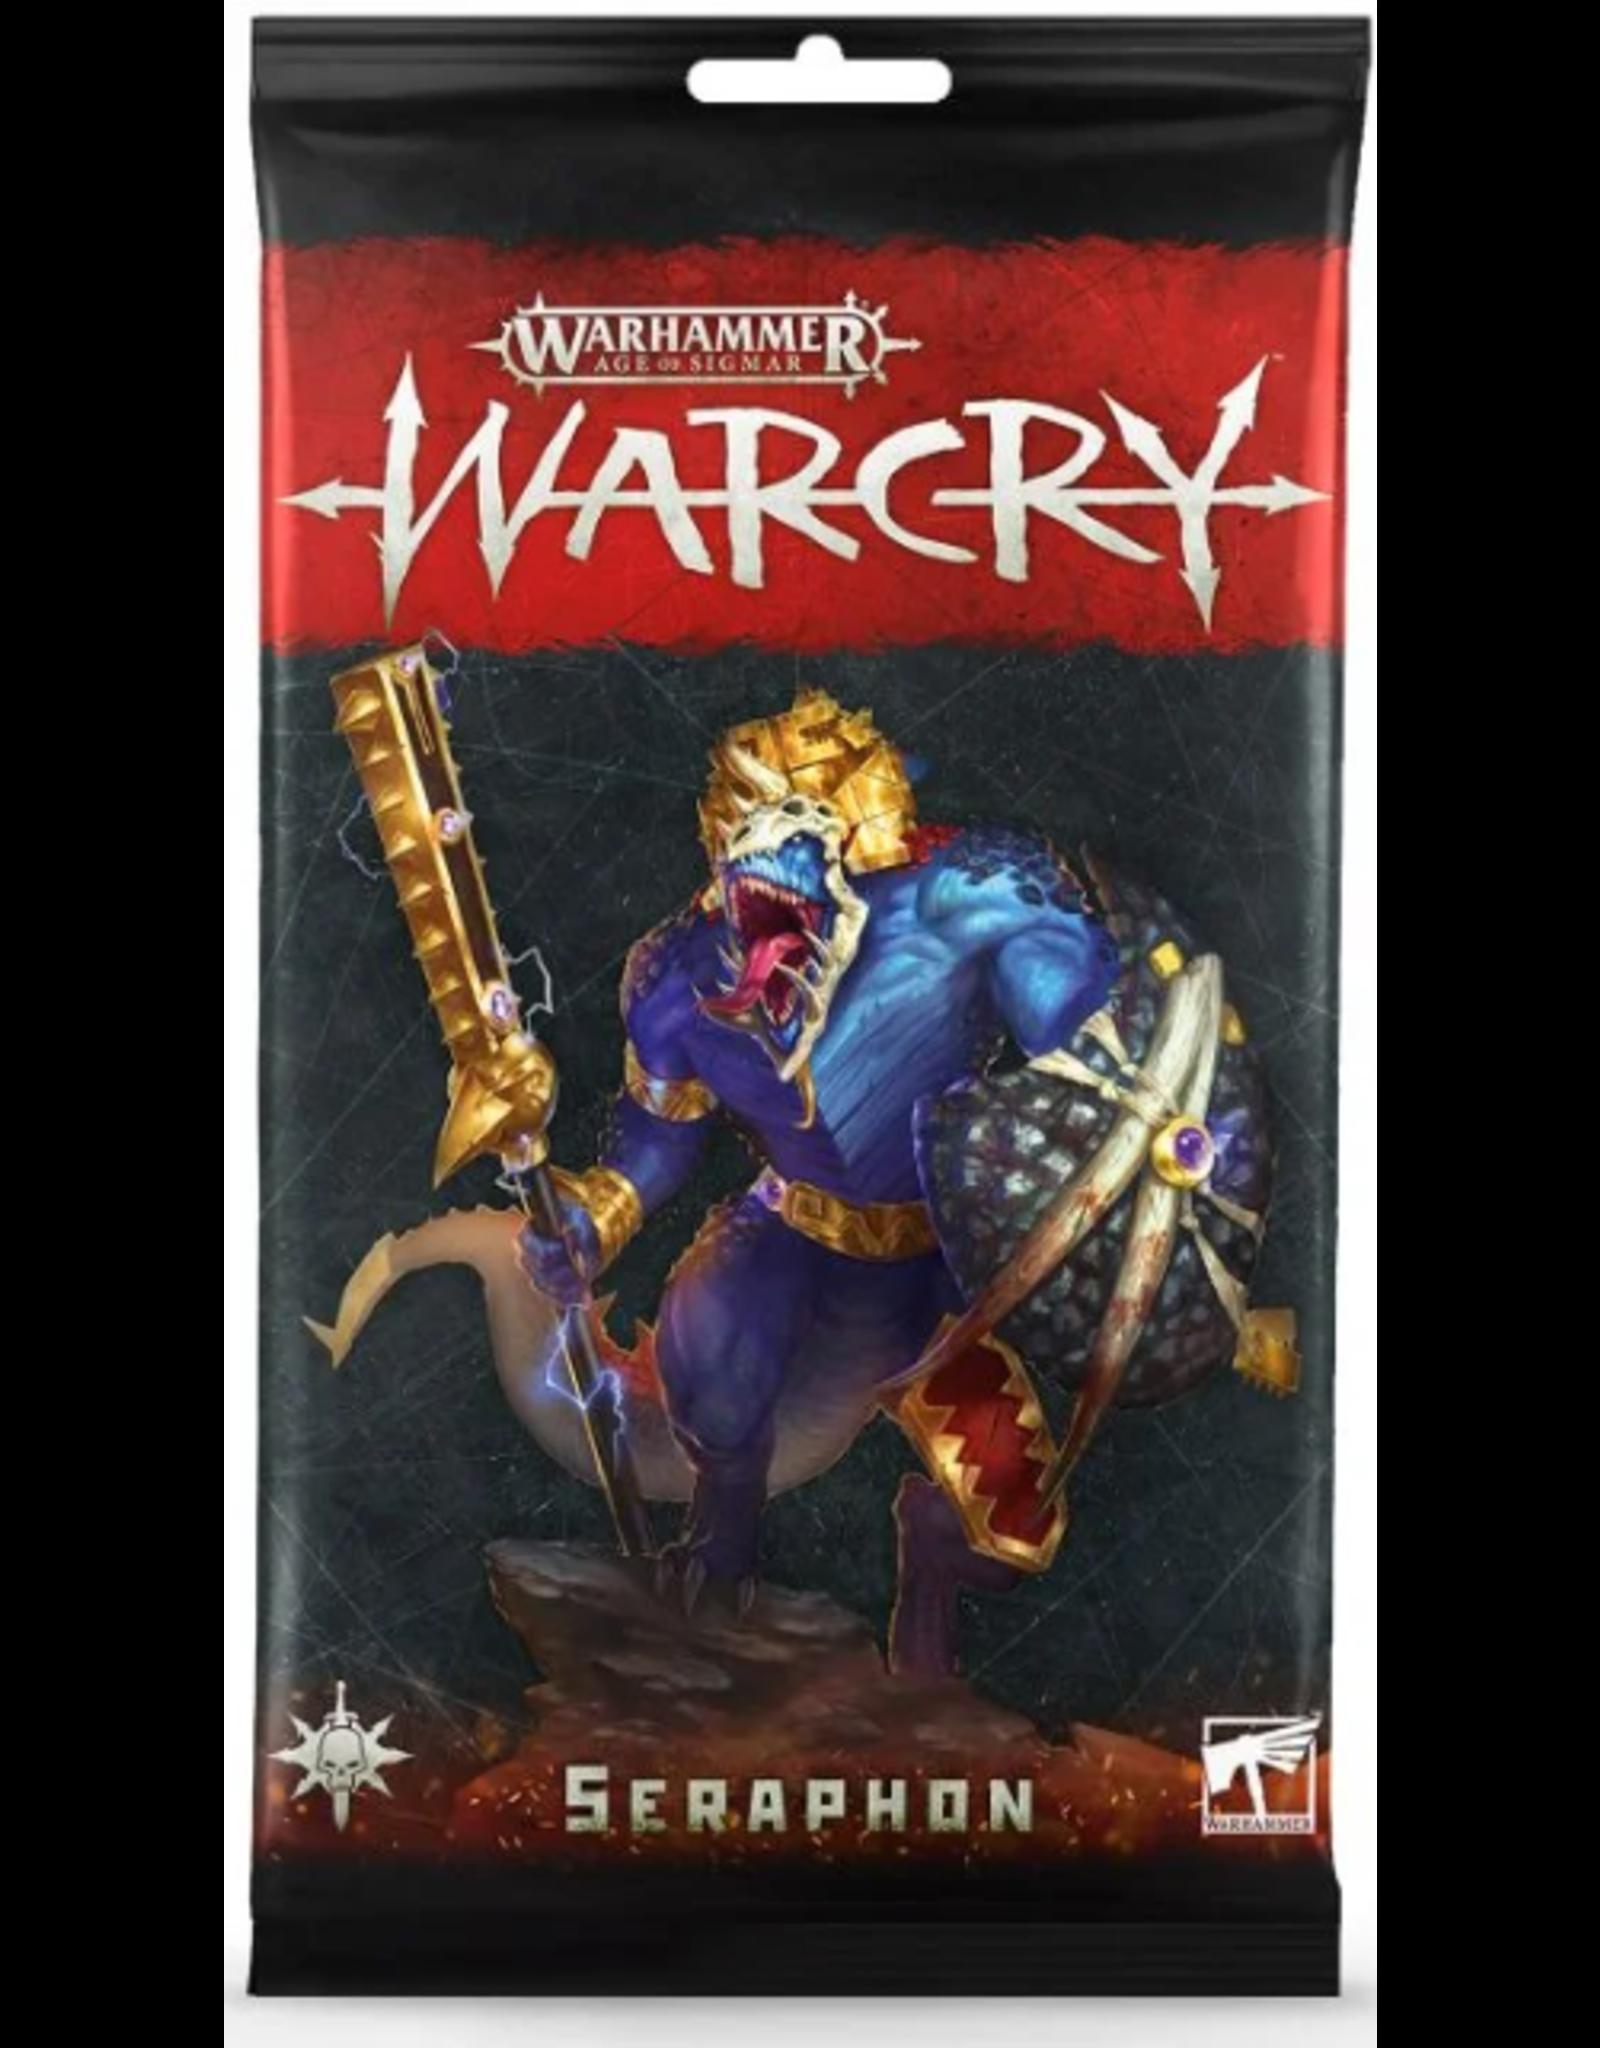 Games Workshop Warhammer Age of Sigmar: Warcry Seraphon Card Pack